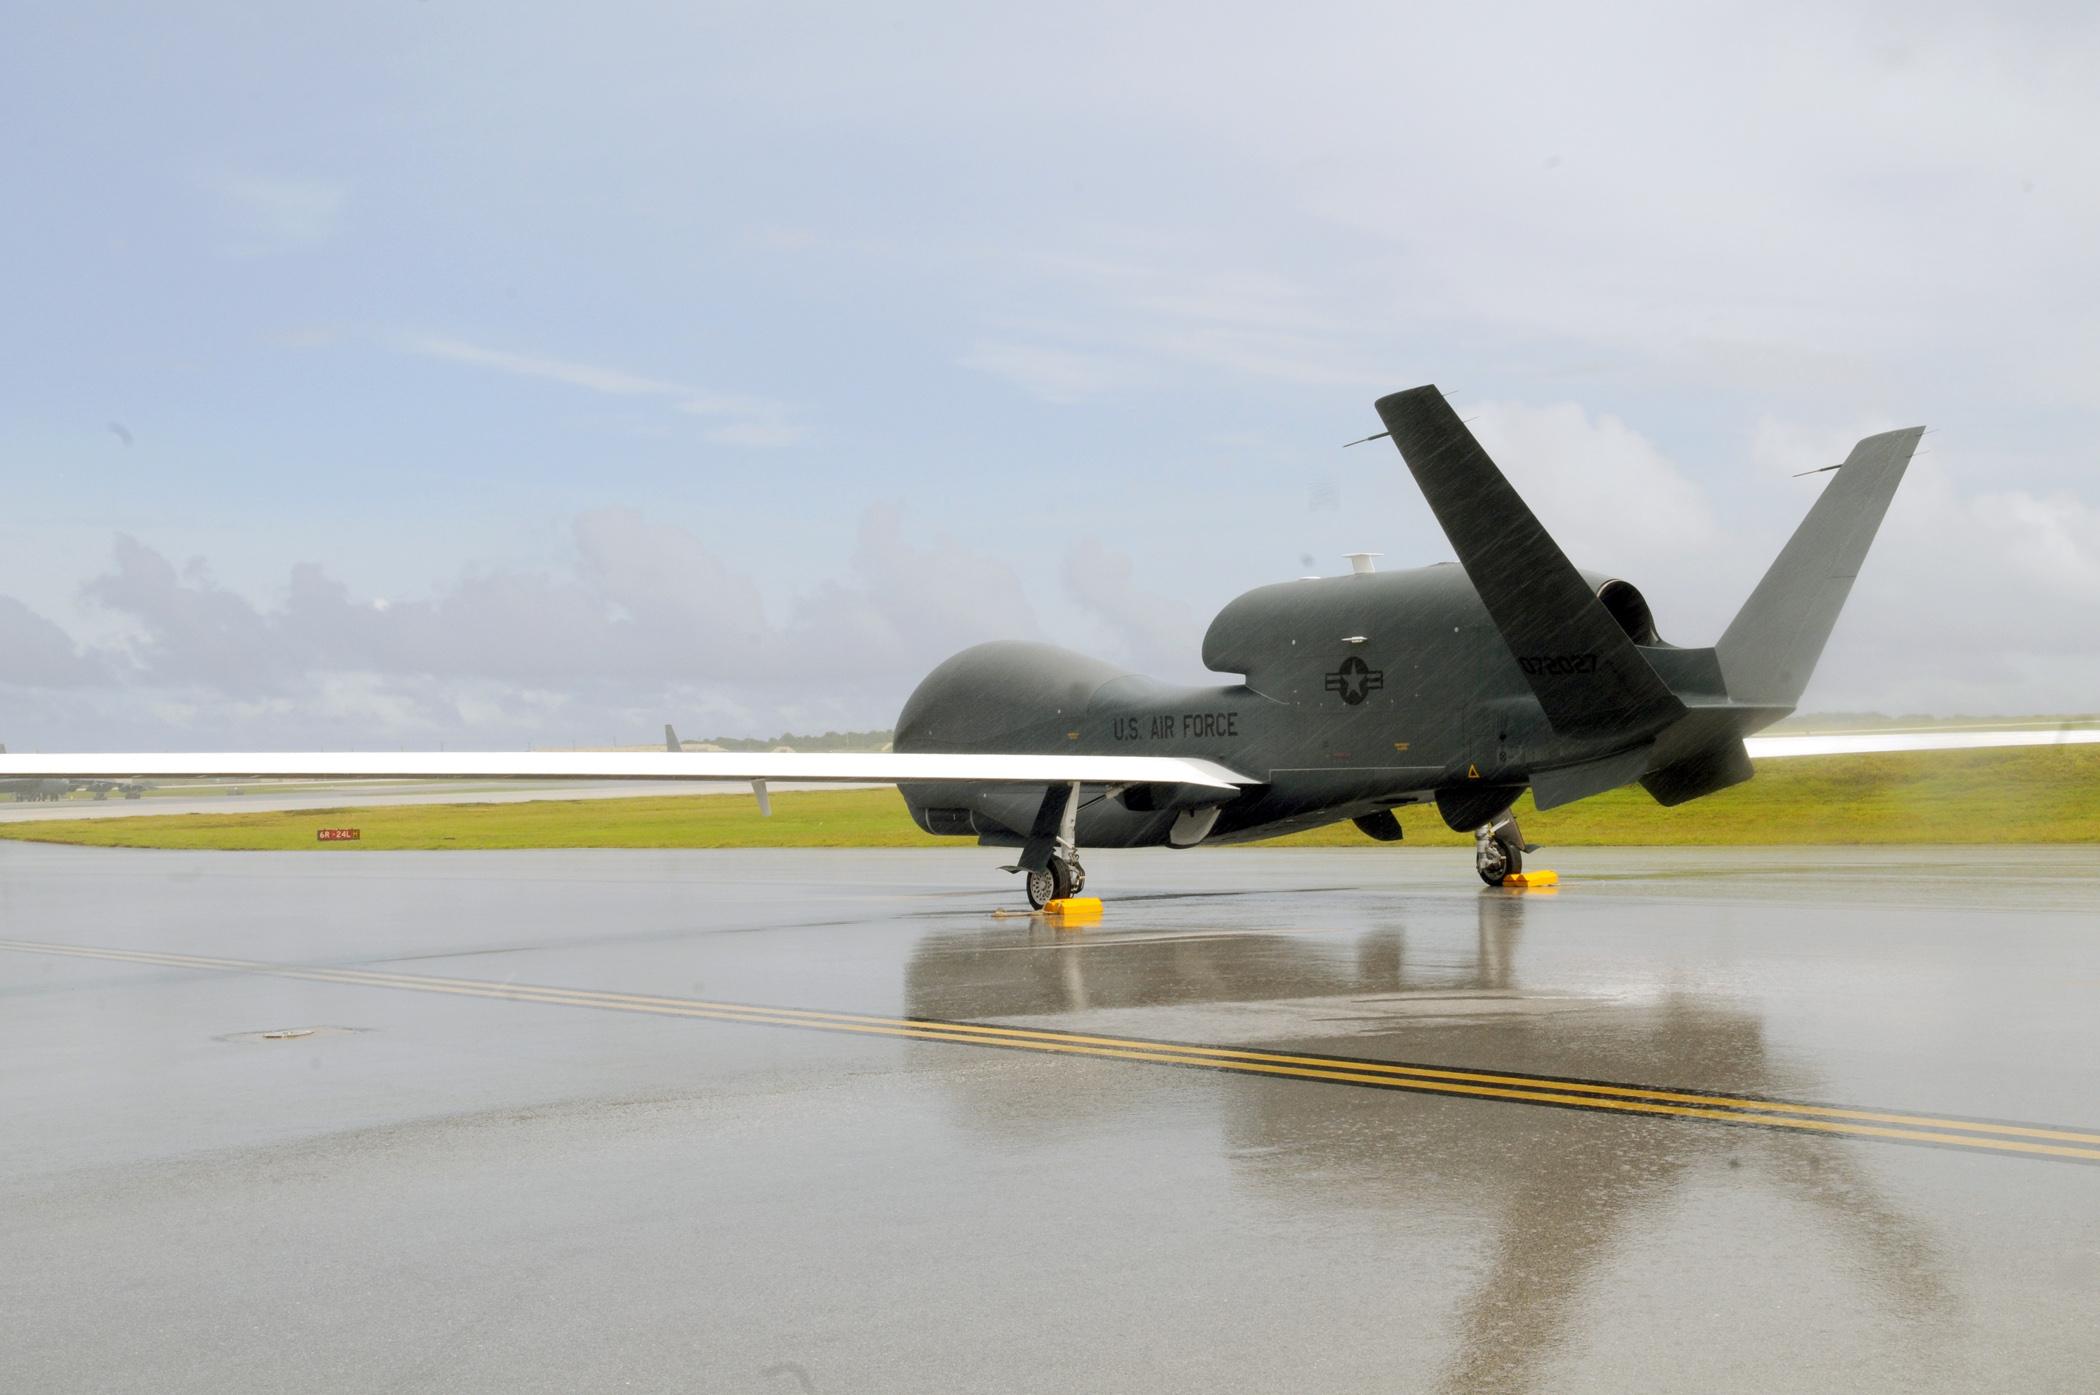 Drones soar in U.S. plans